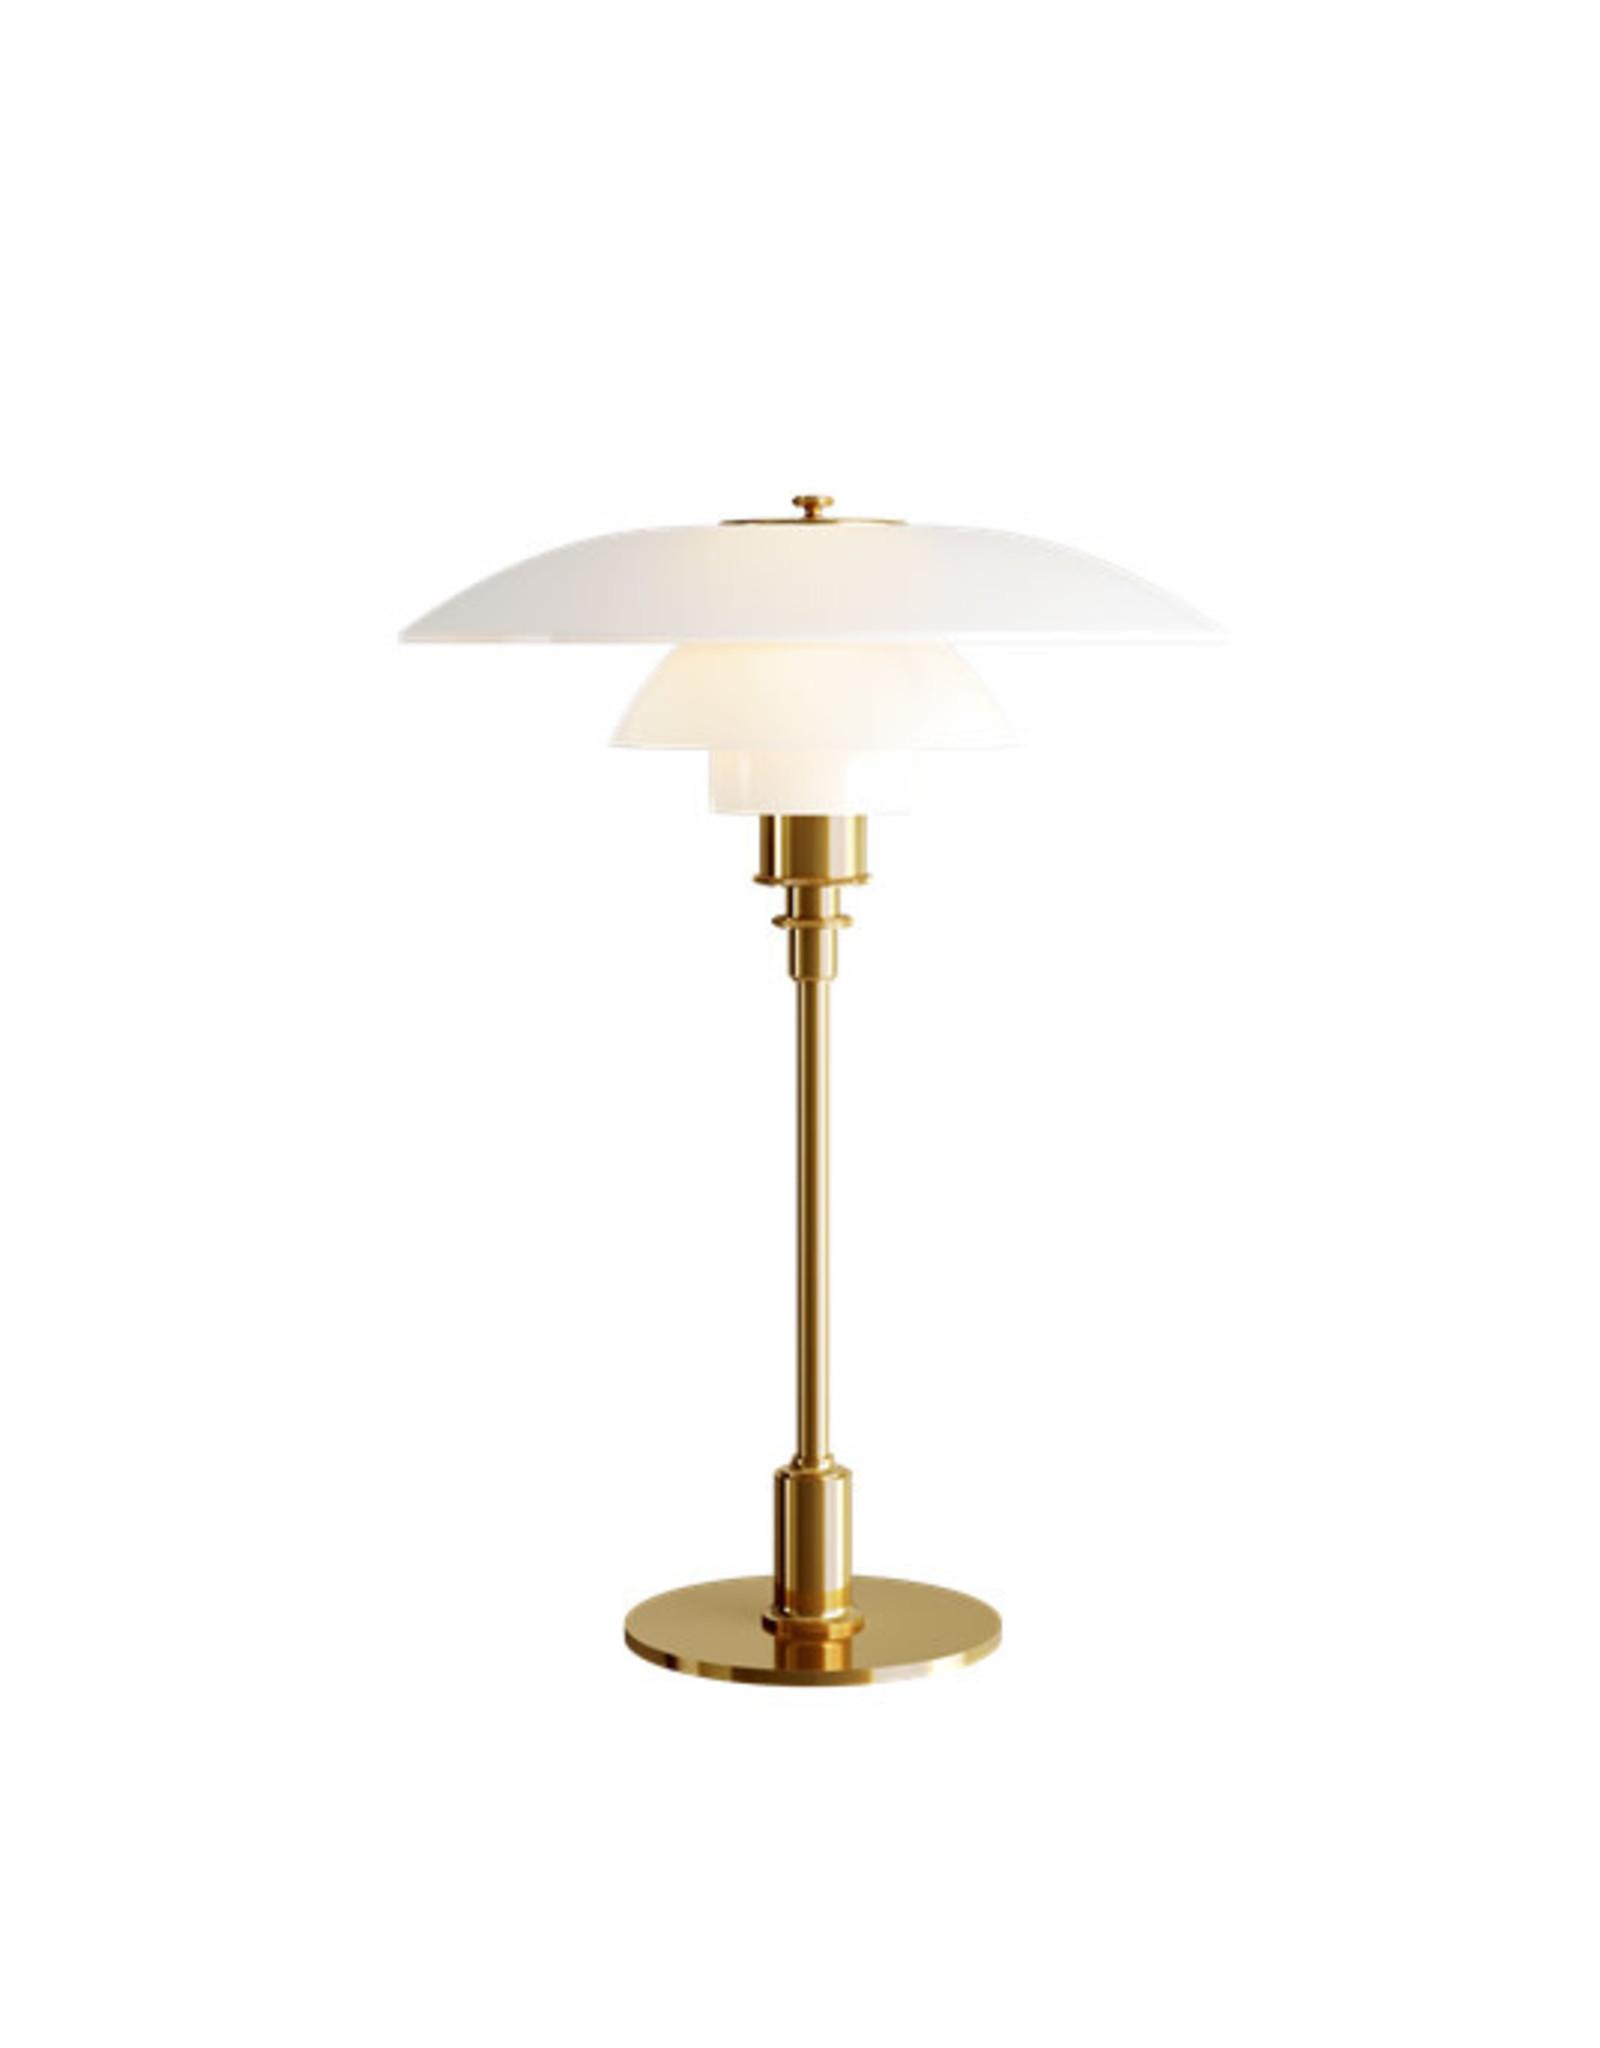 PH 3½-2½ 黃銅色檯燈